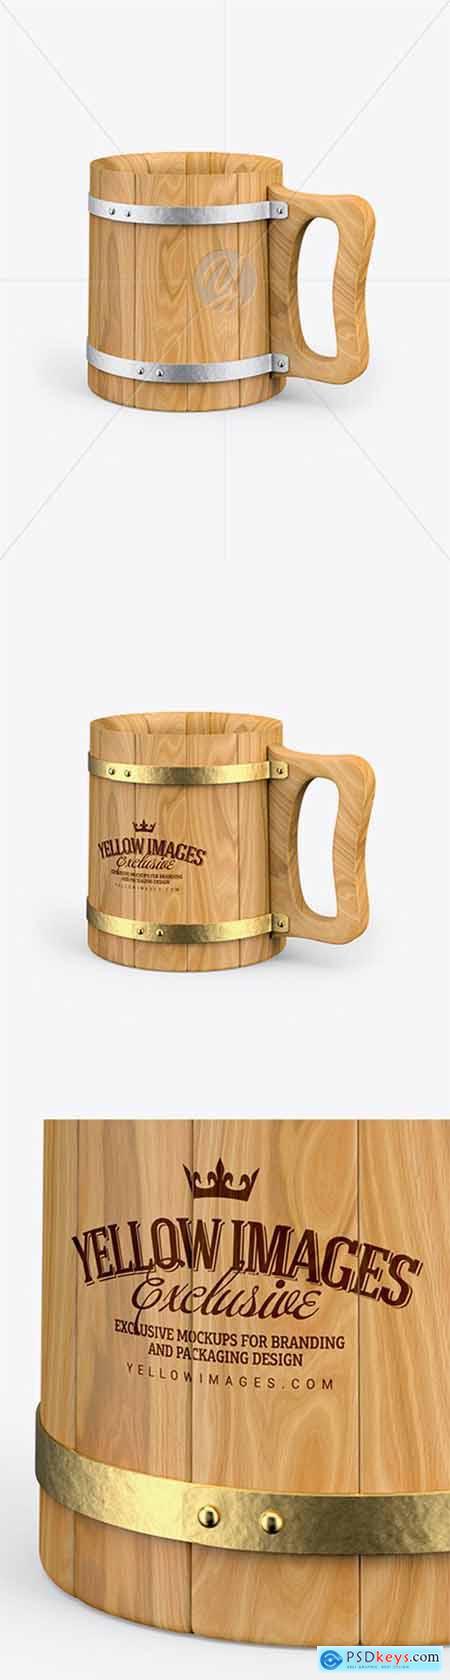 Wooden Mug Mockup